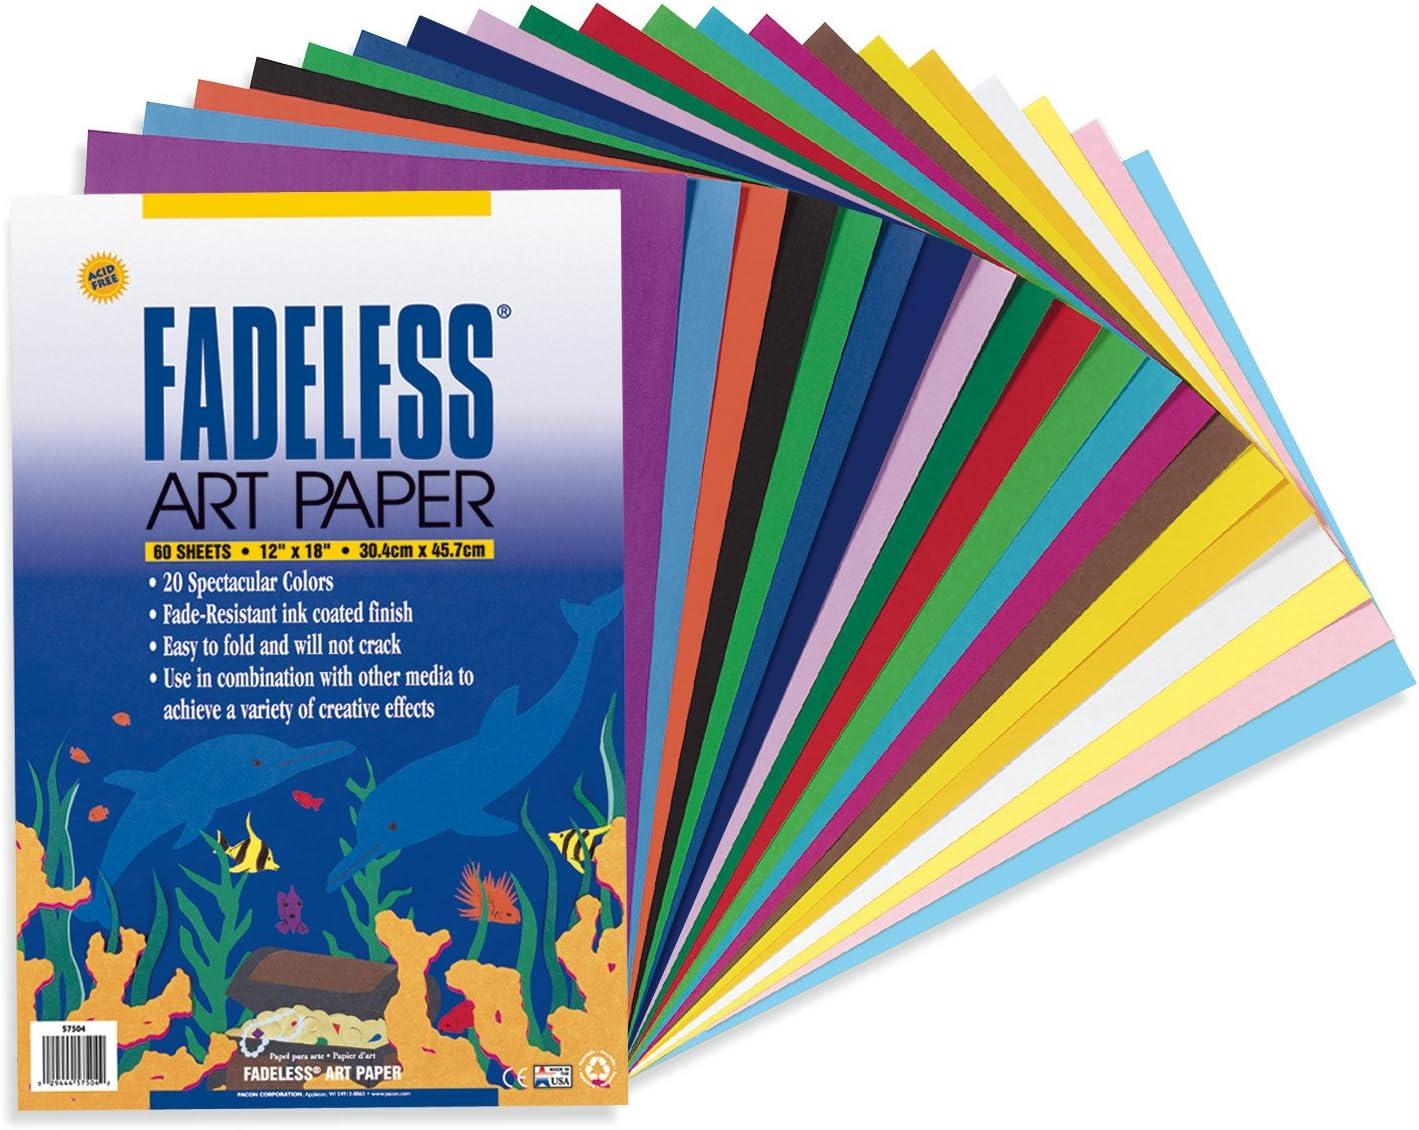 B00006IDYE Fadeless Art Paper, 50 lb., 12 x 18 Inches, Multiple Colors, 60 Sheets 81YcGUoNpyL